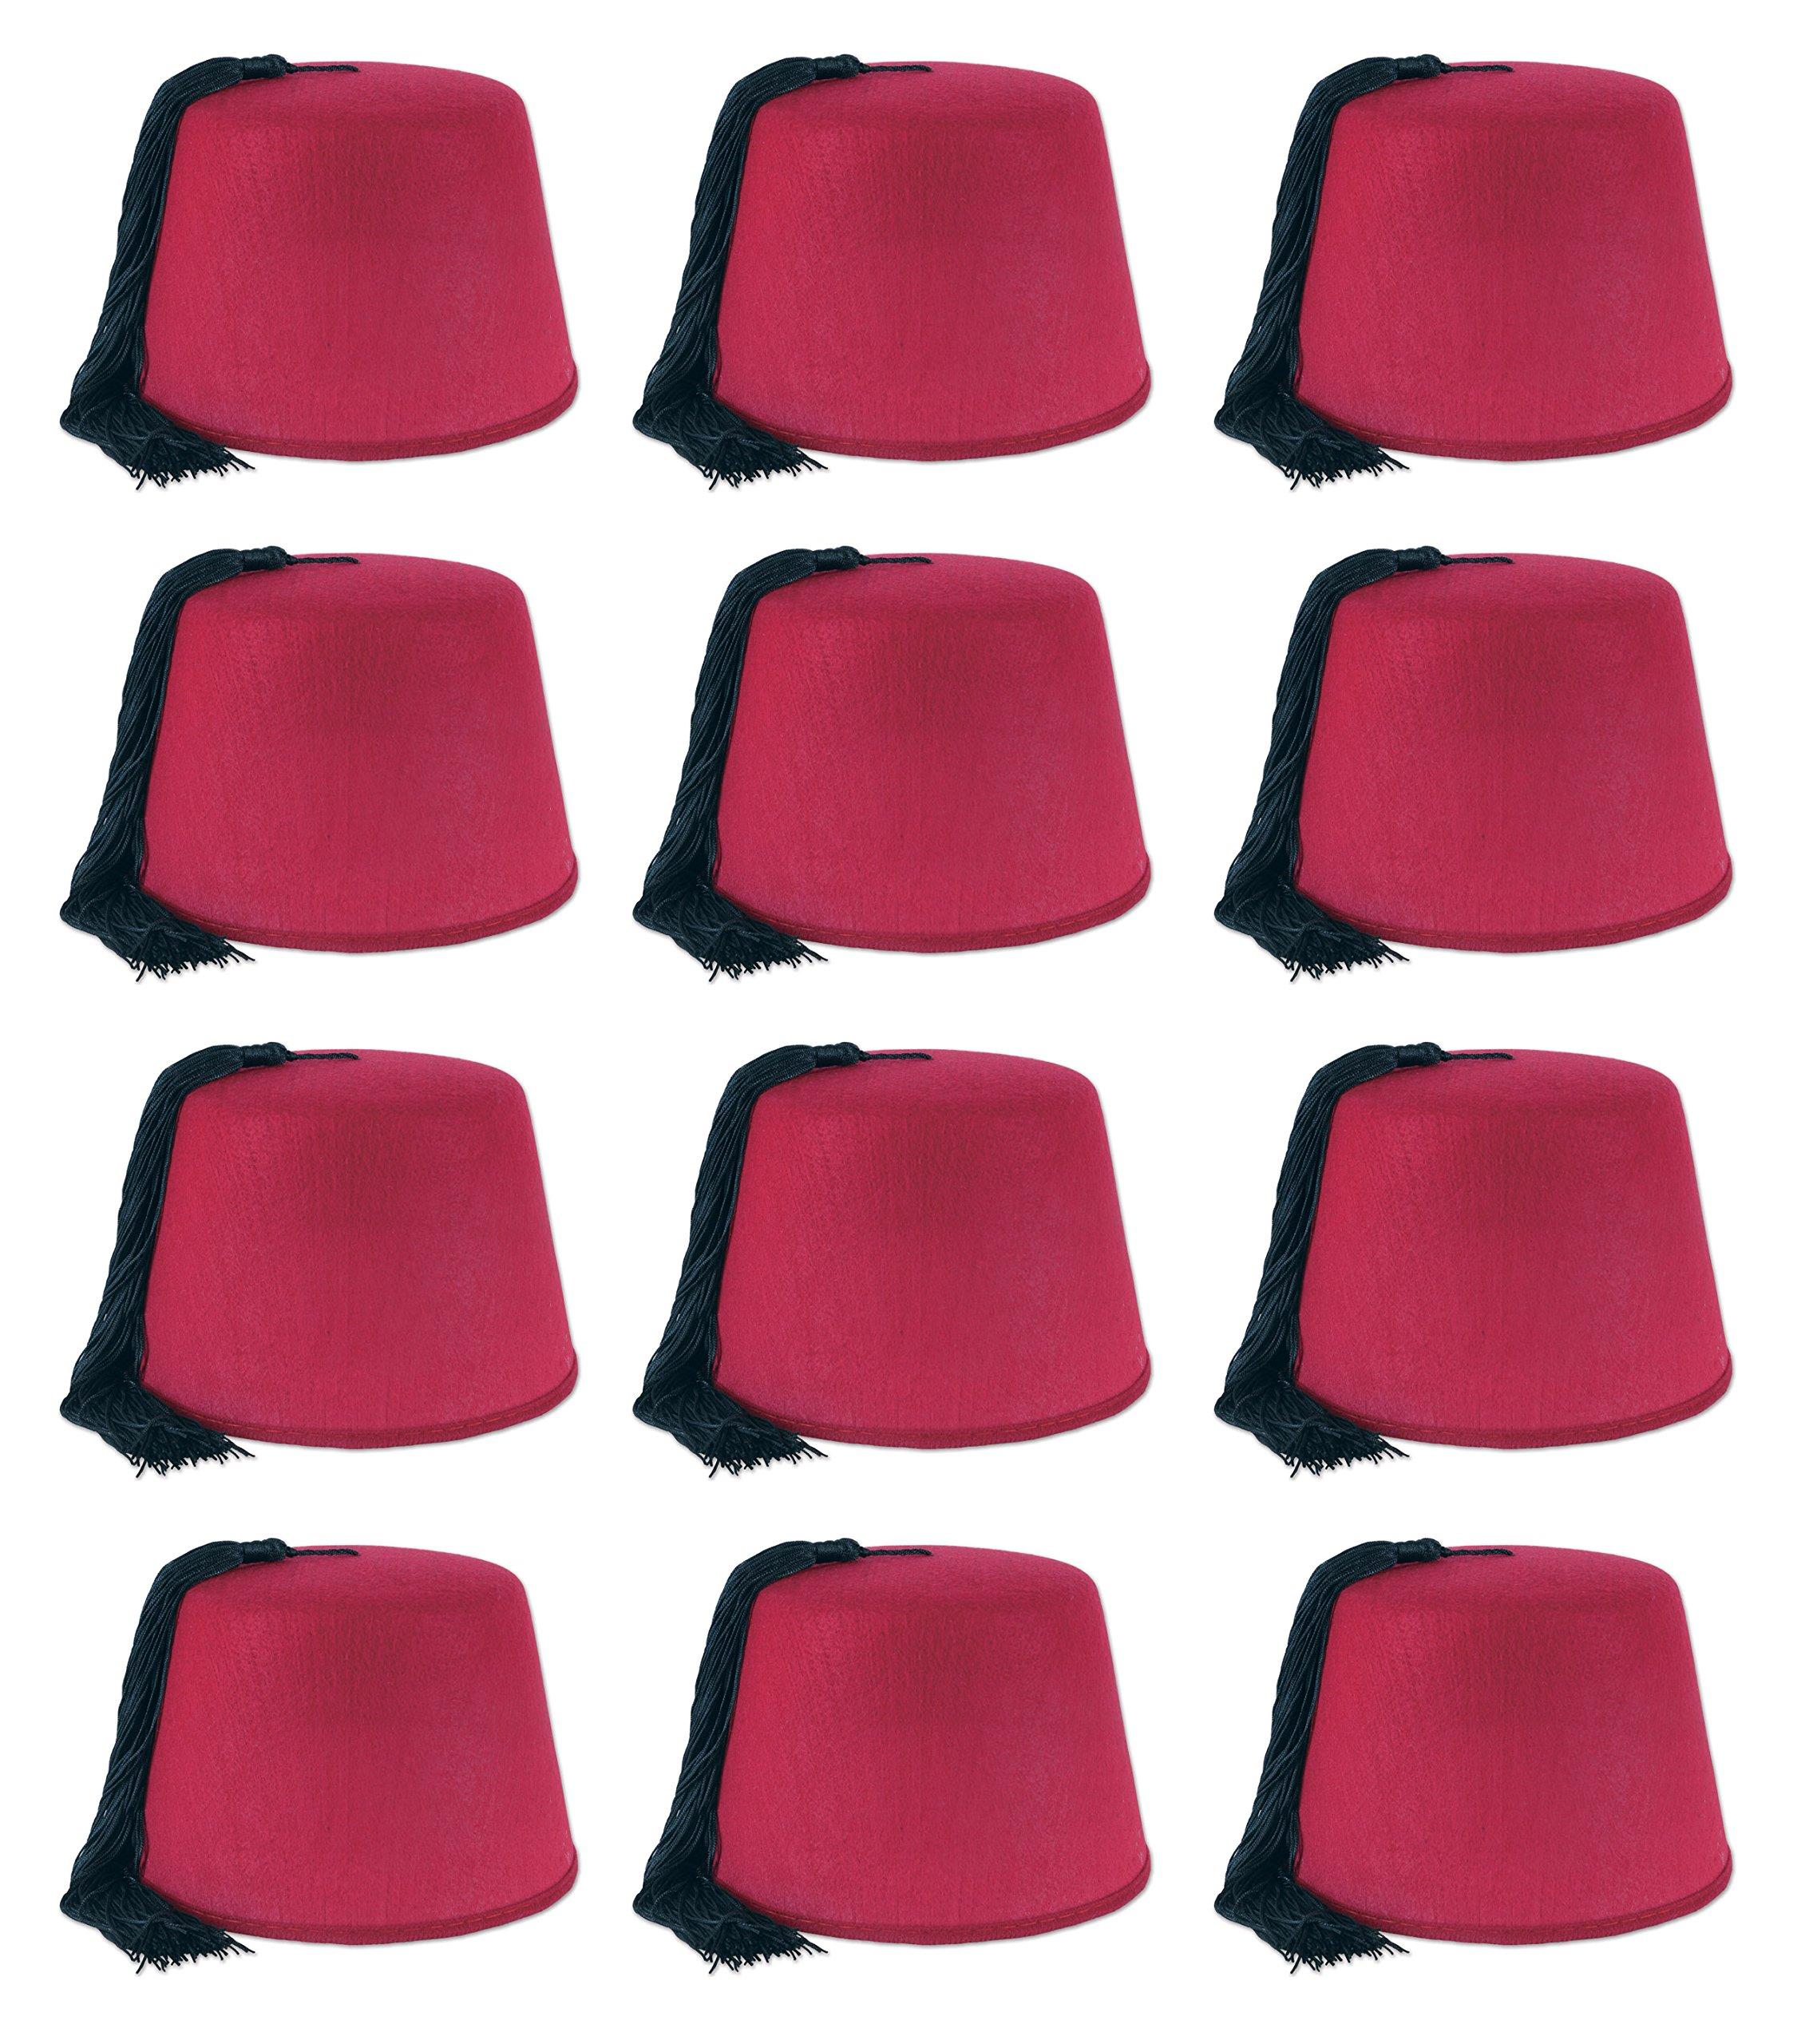 Beistle 60065 12 Piece Felt Fez Hats, Red/Black